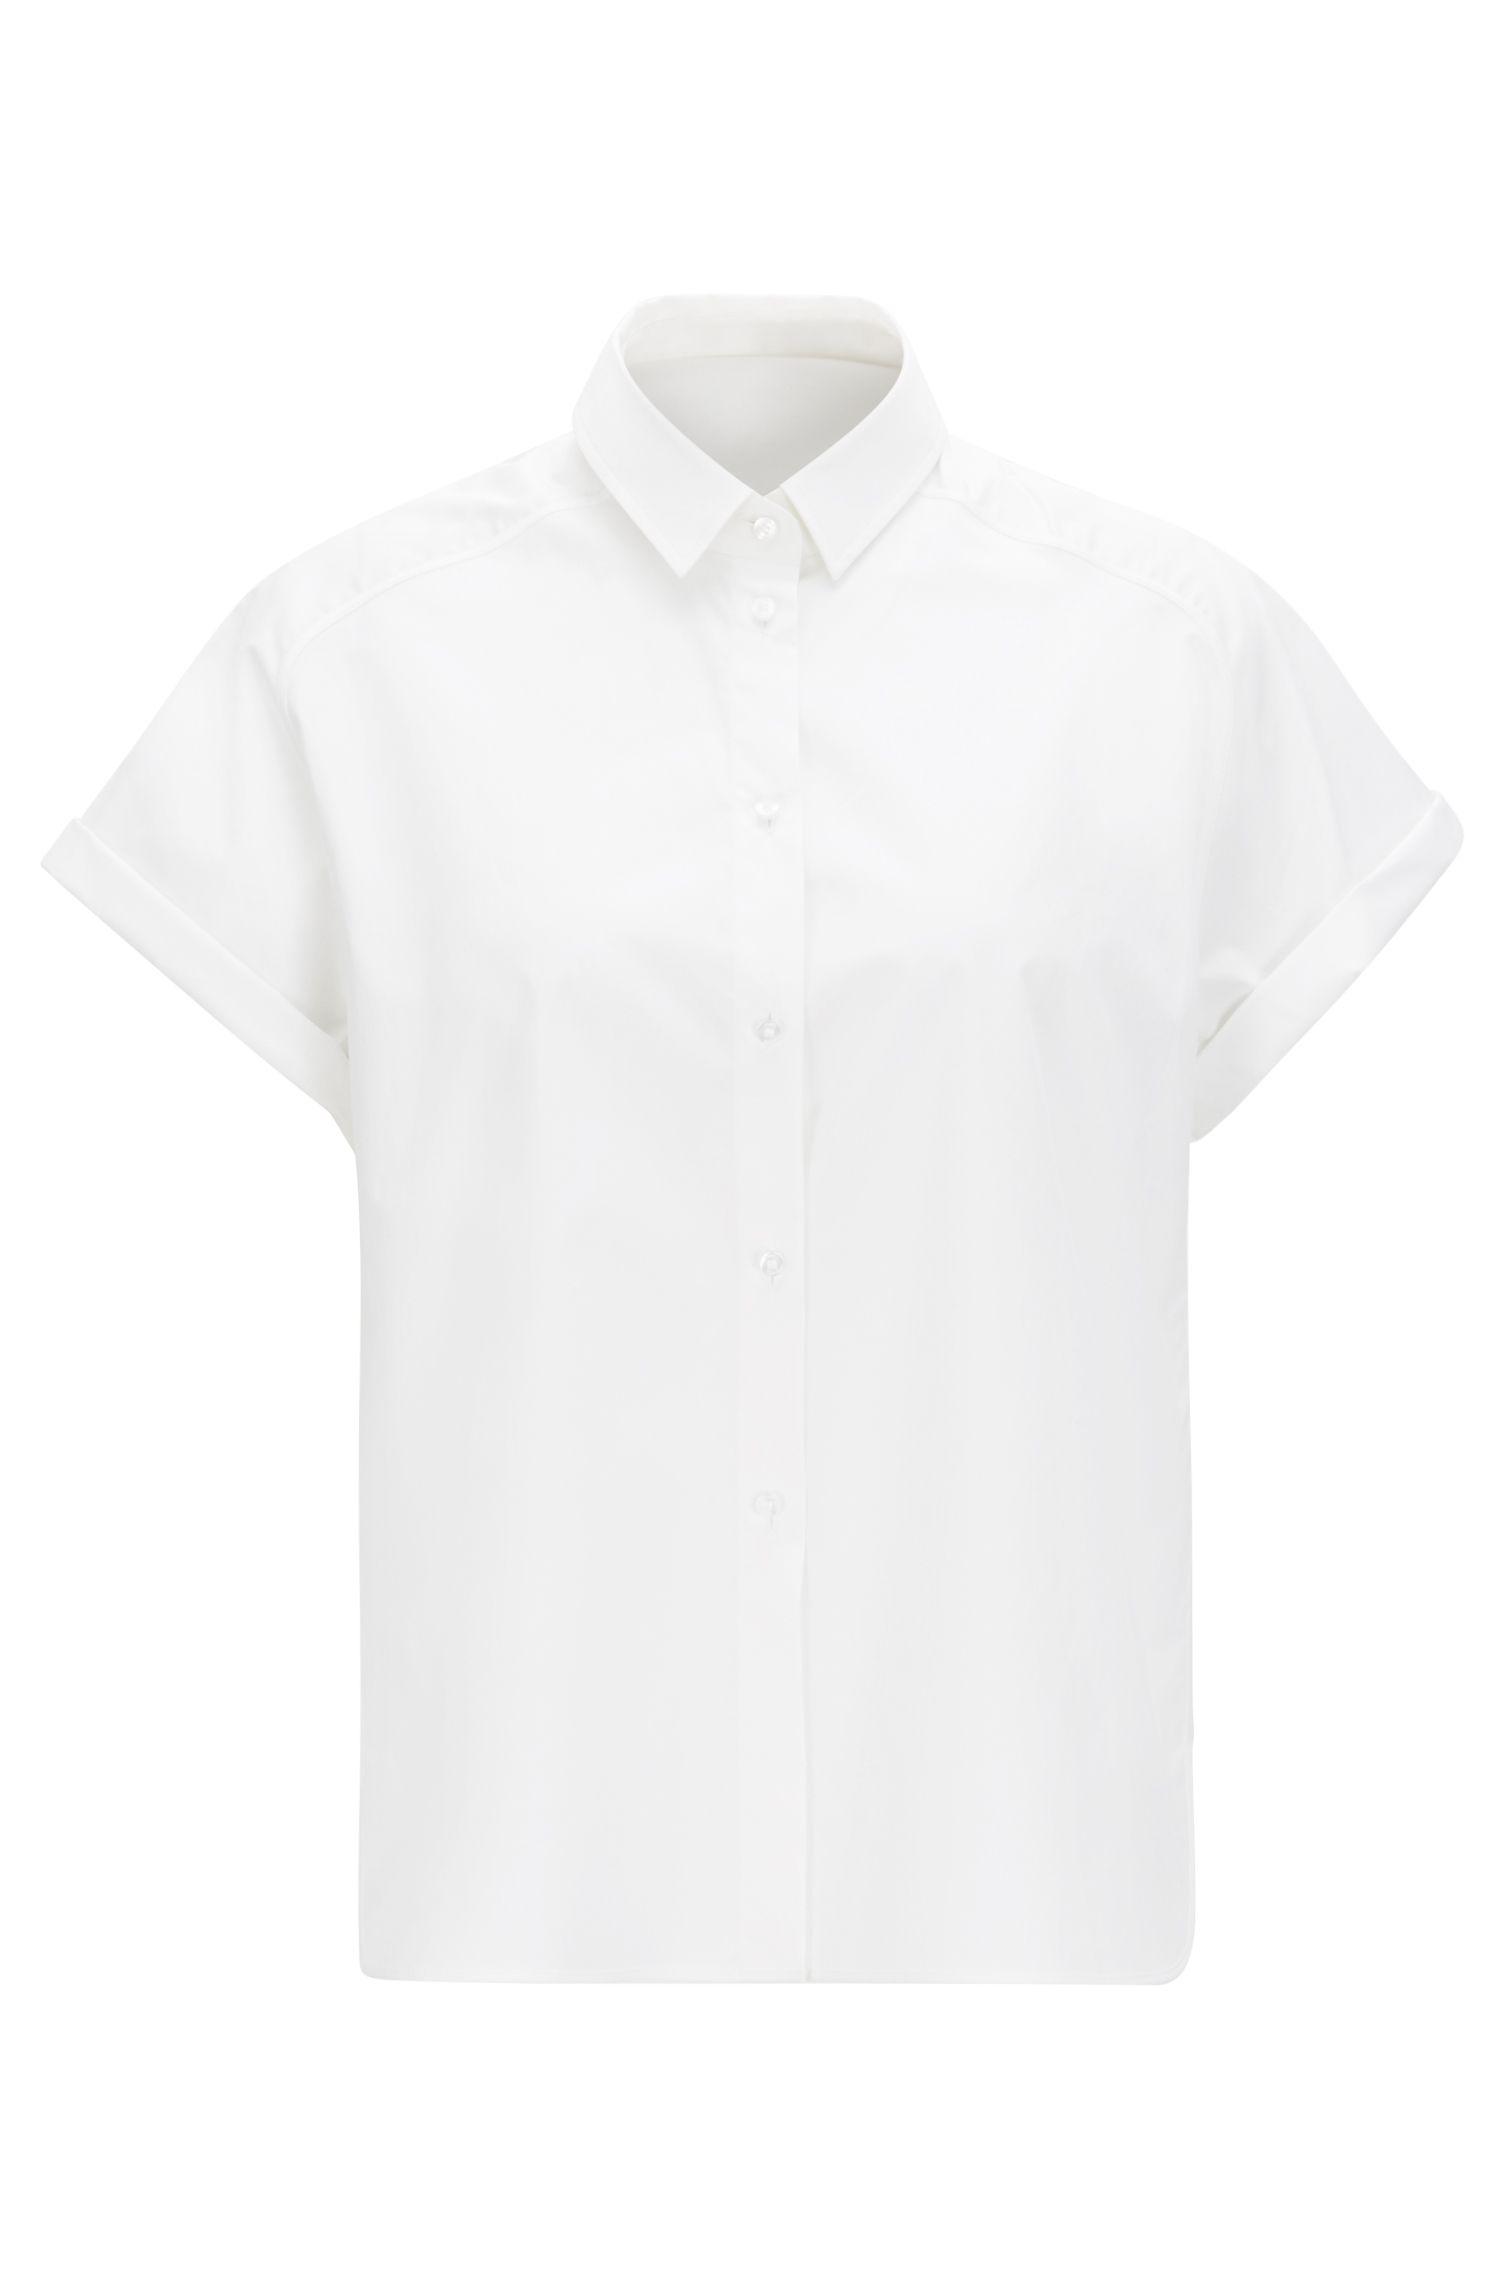 Blusa relaxed fit en algodón elástico suave